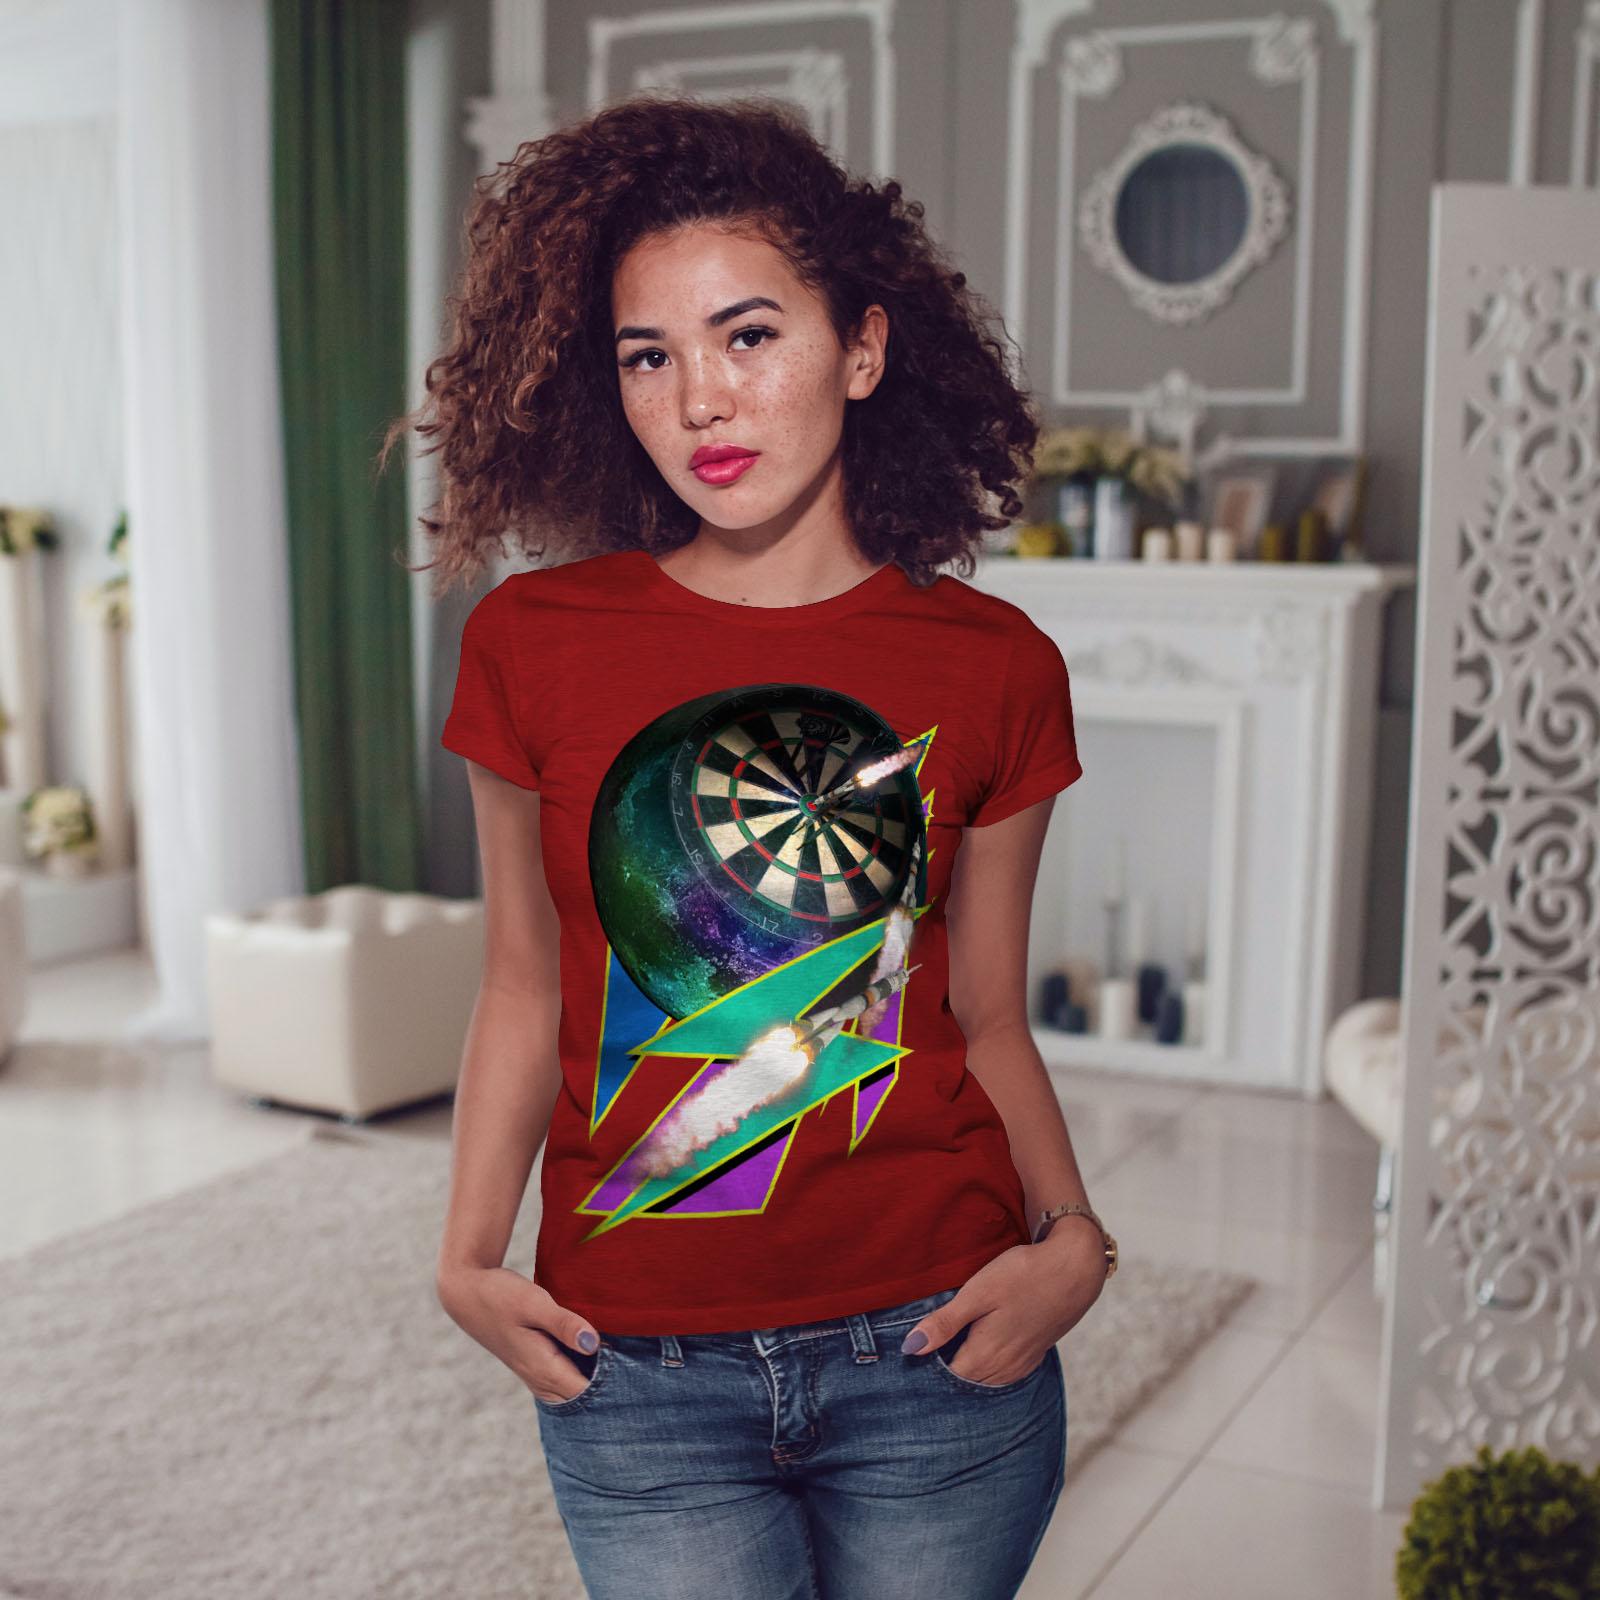 miniature 11 - Wellcoda Dart Board Gaming Womens T-shirt, Achieve Casual Design Printed Tee